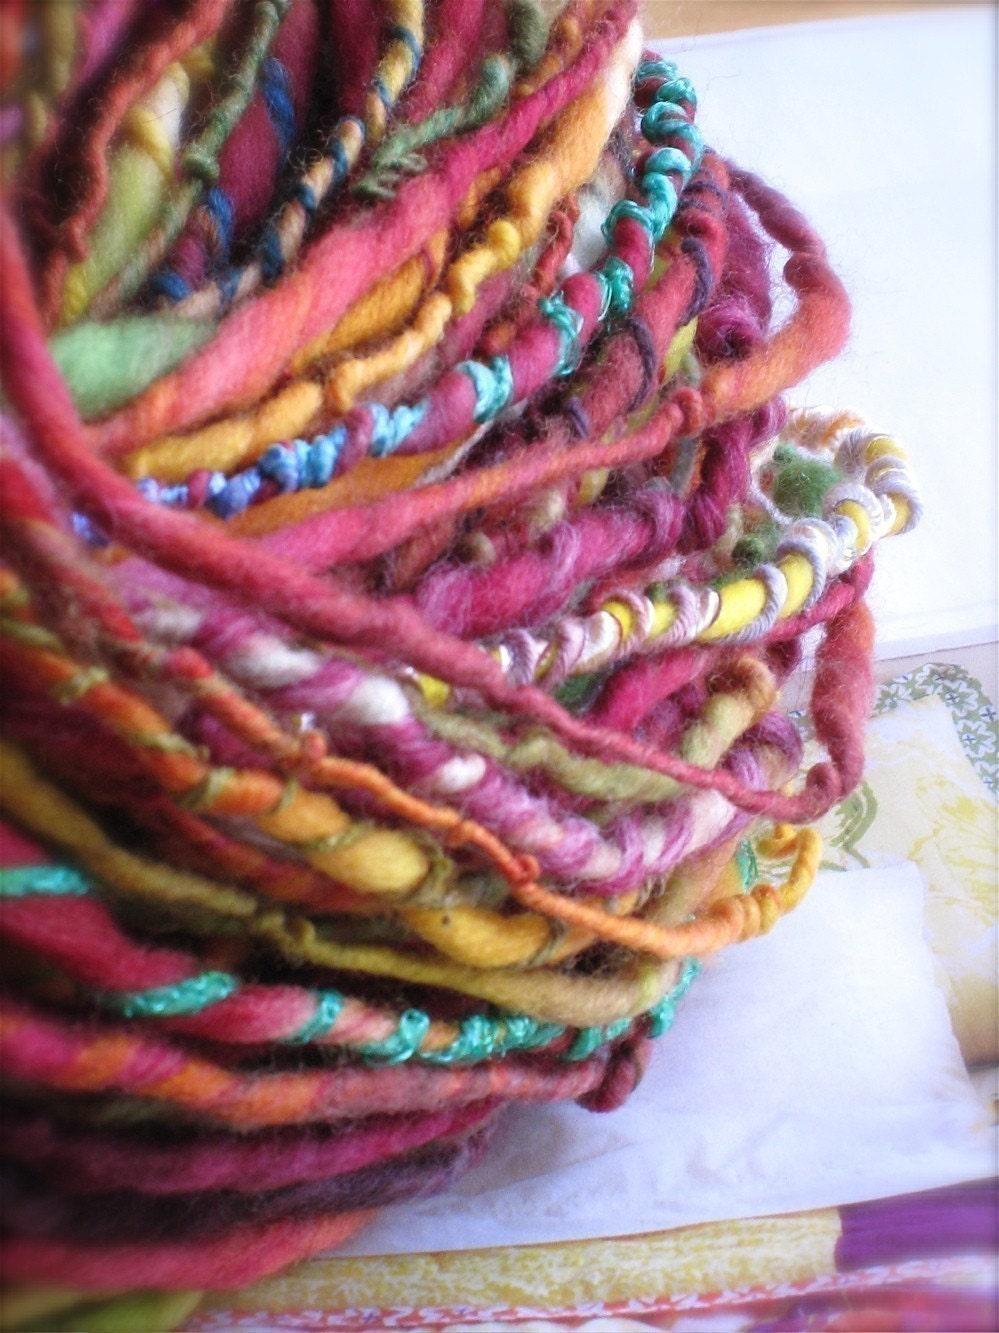 PARFAIT - handspun and handpainted gypsy yarn by pancake and lulu